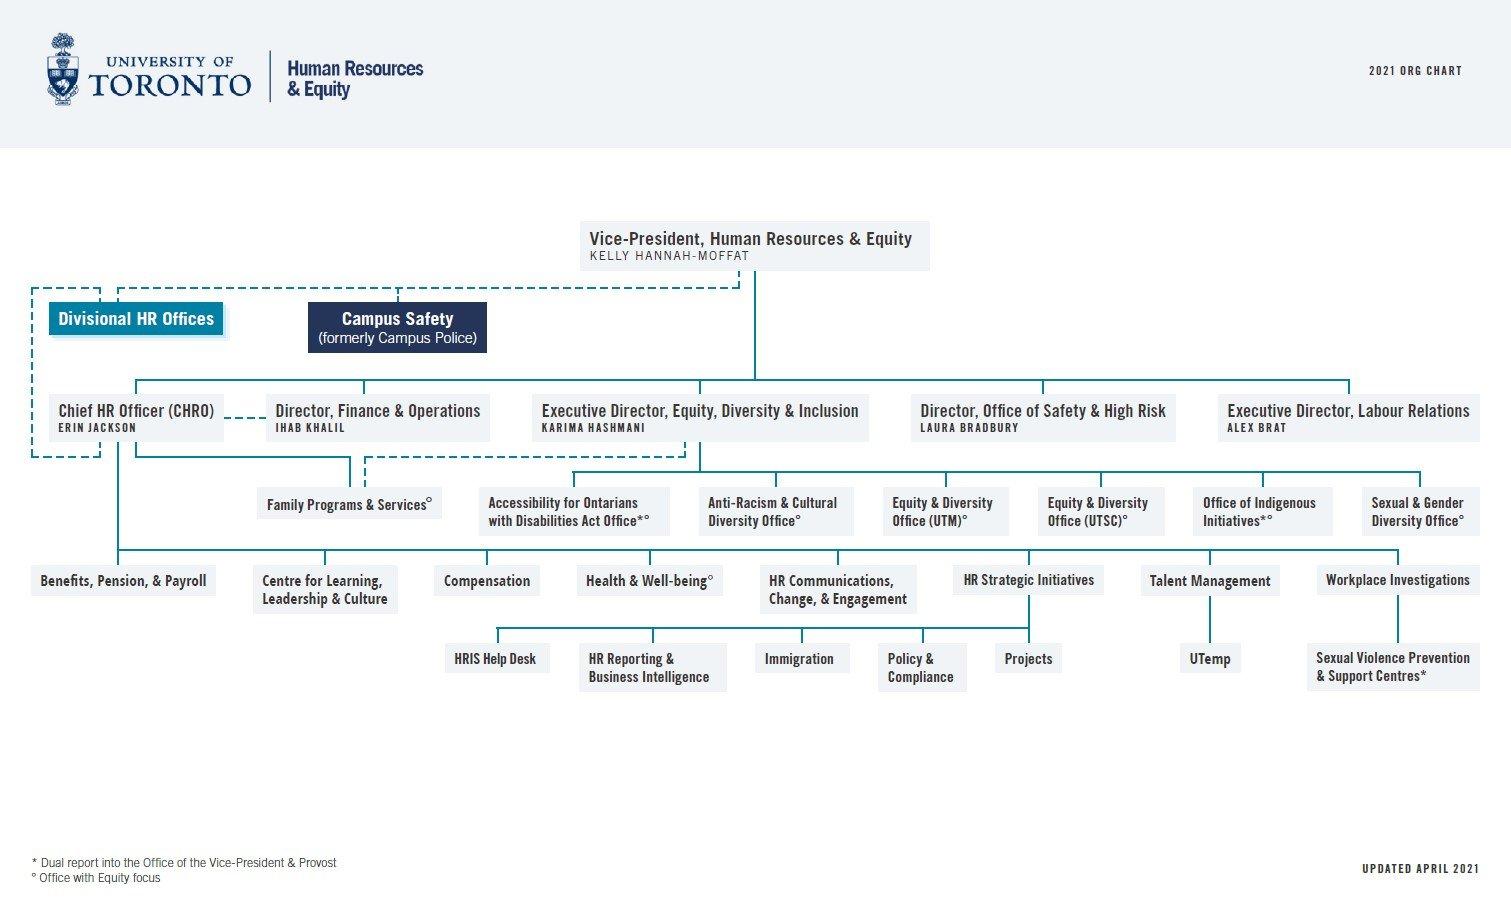 HR & Equity Organizational Chart